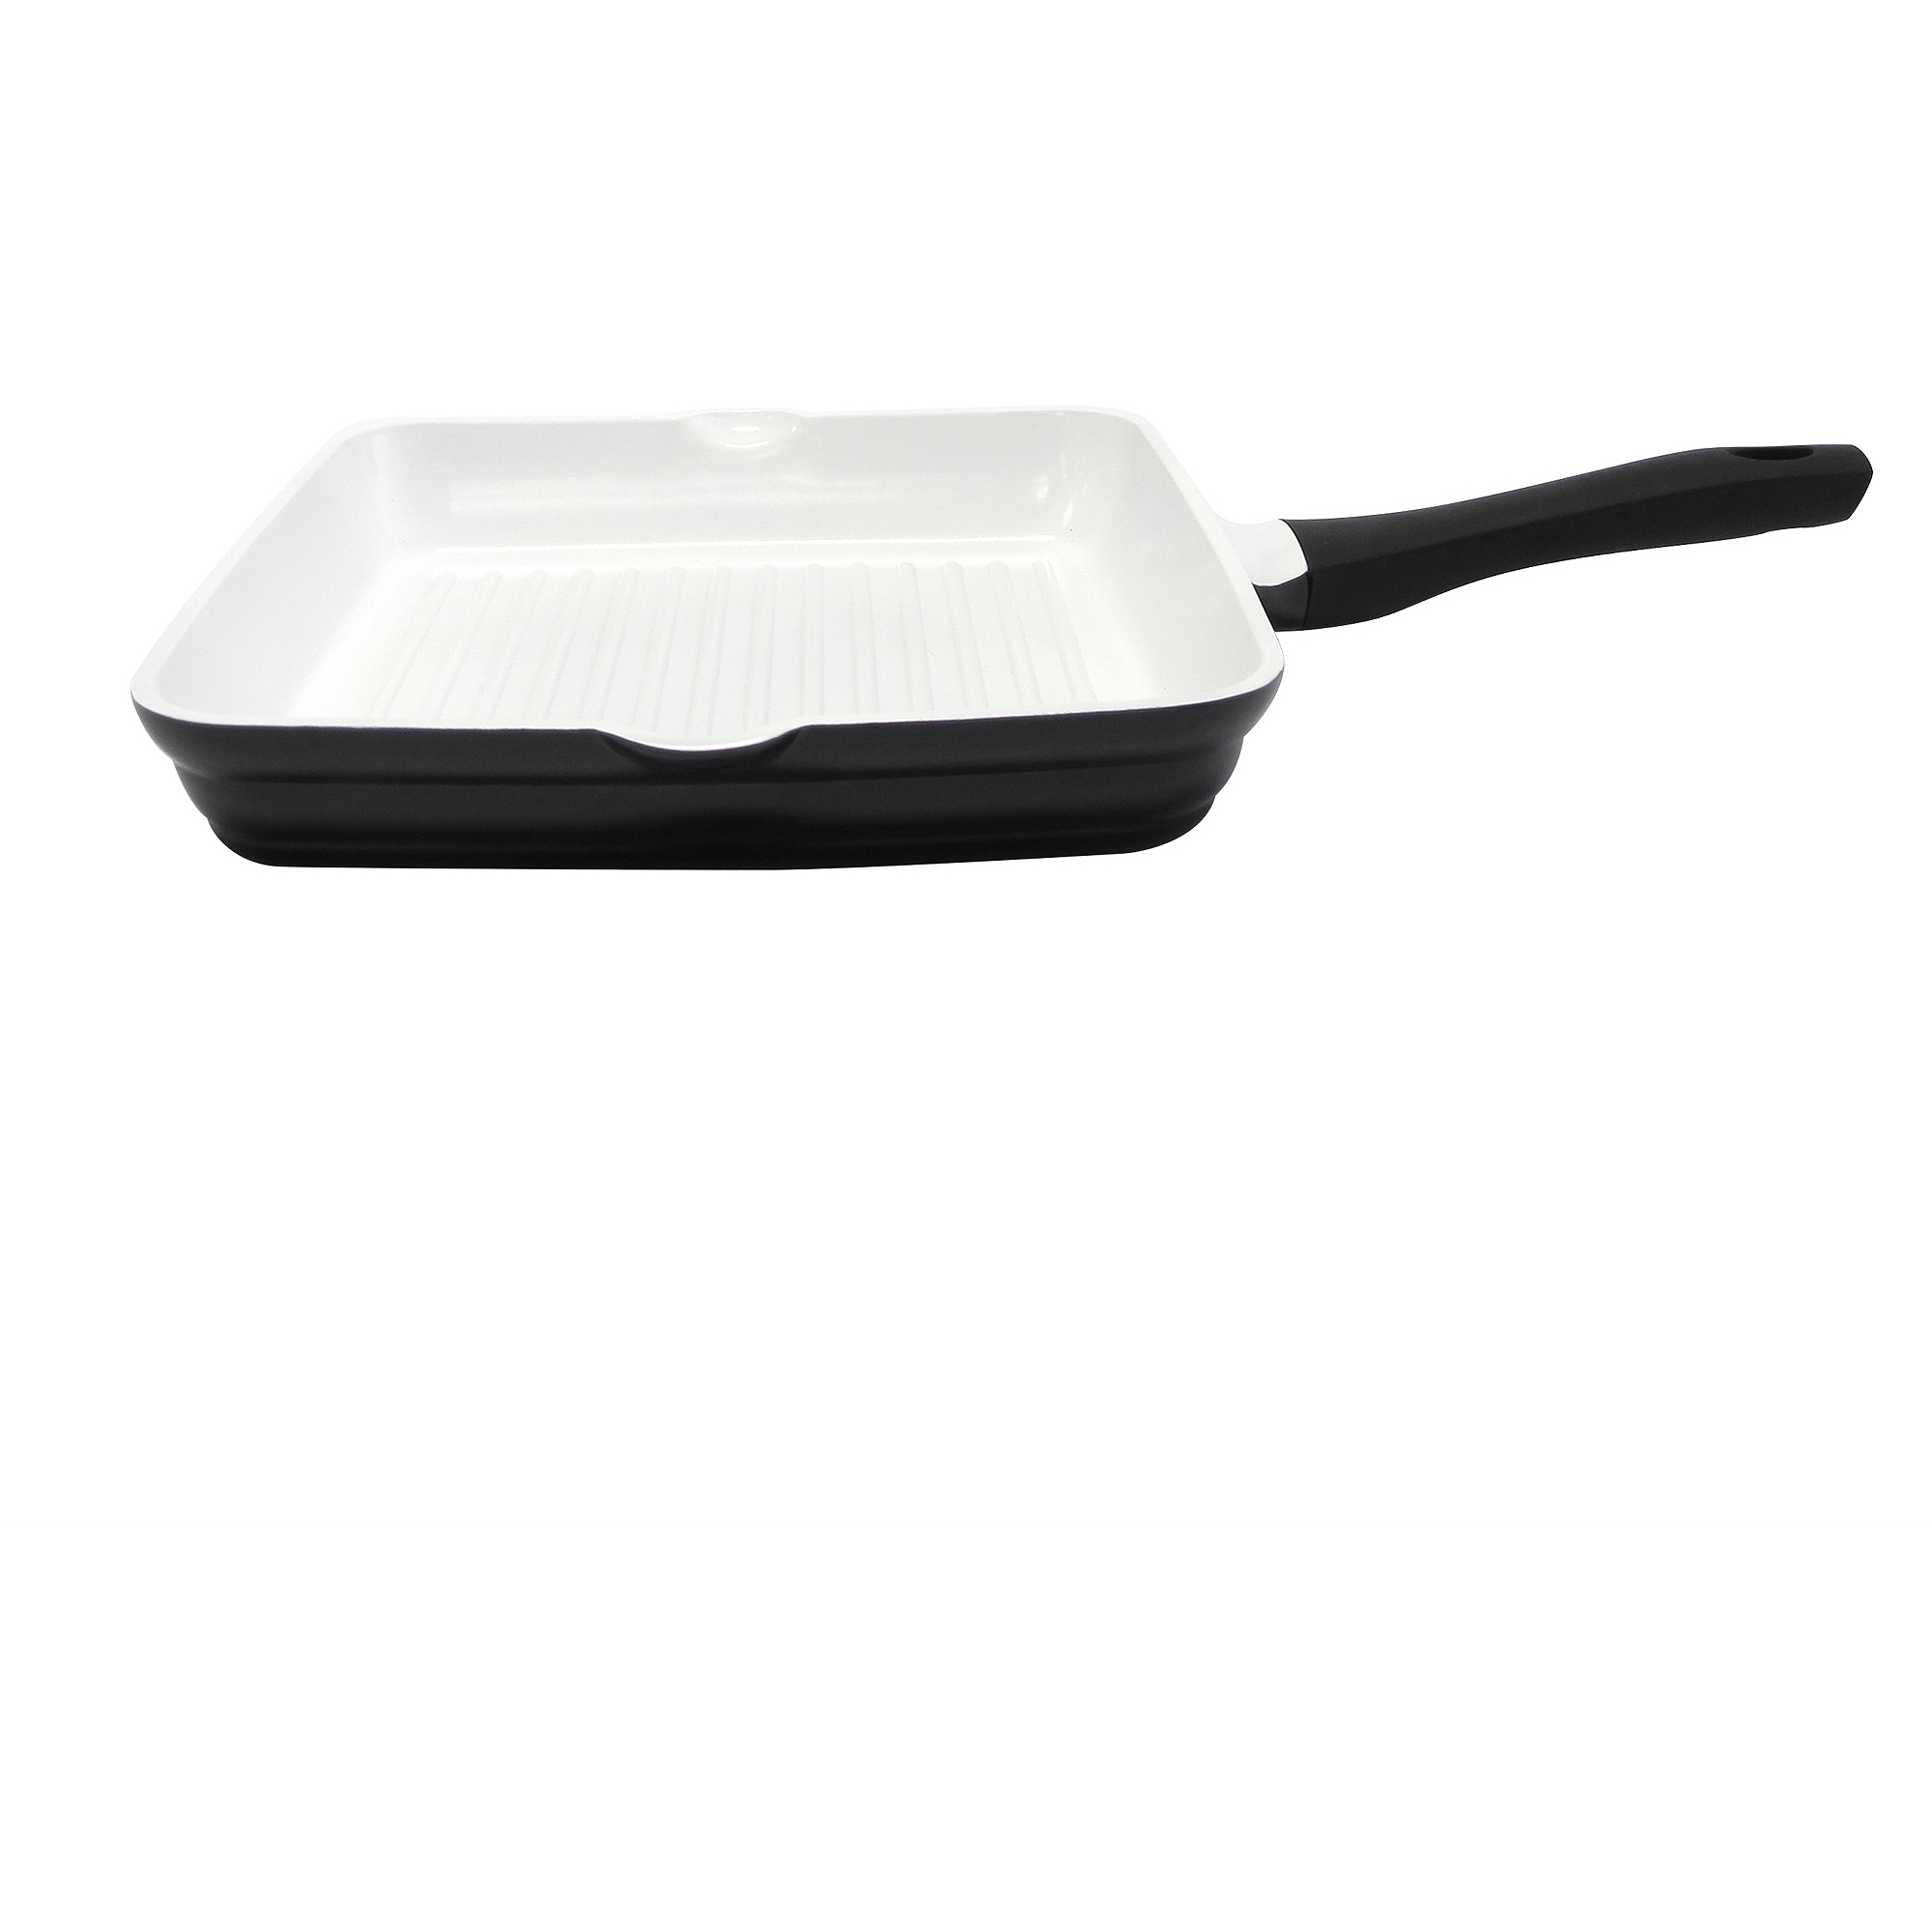 "CeraCast 11"" Ceramic Non-Stick Grill Pan"